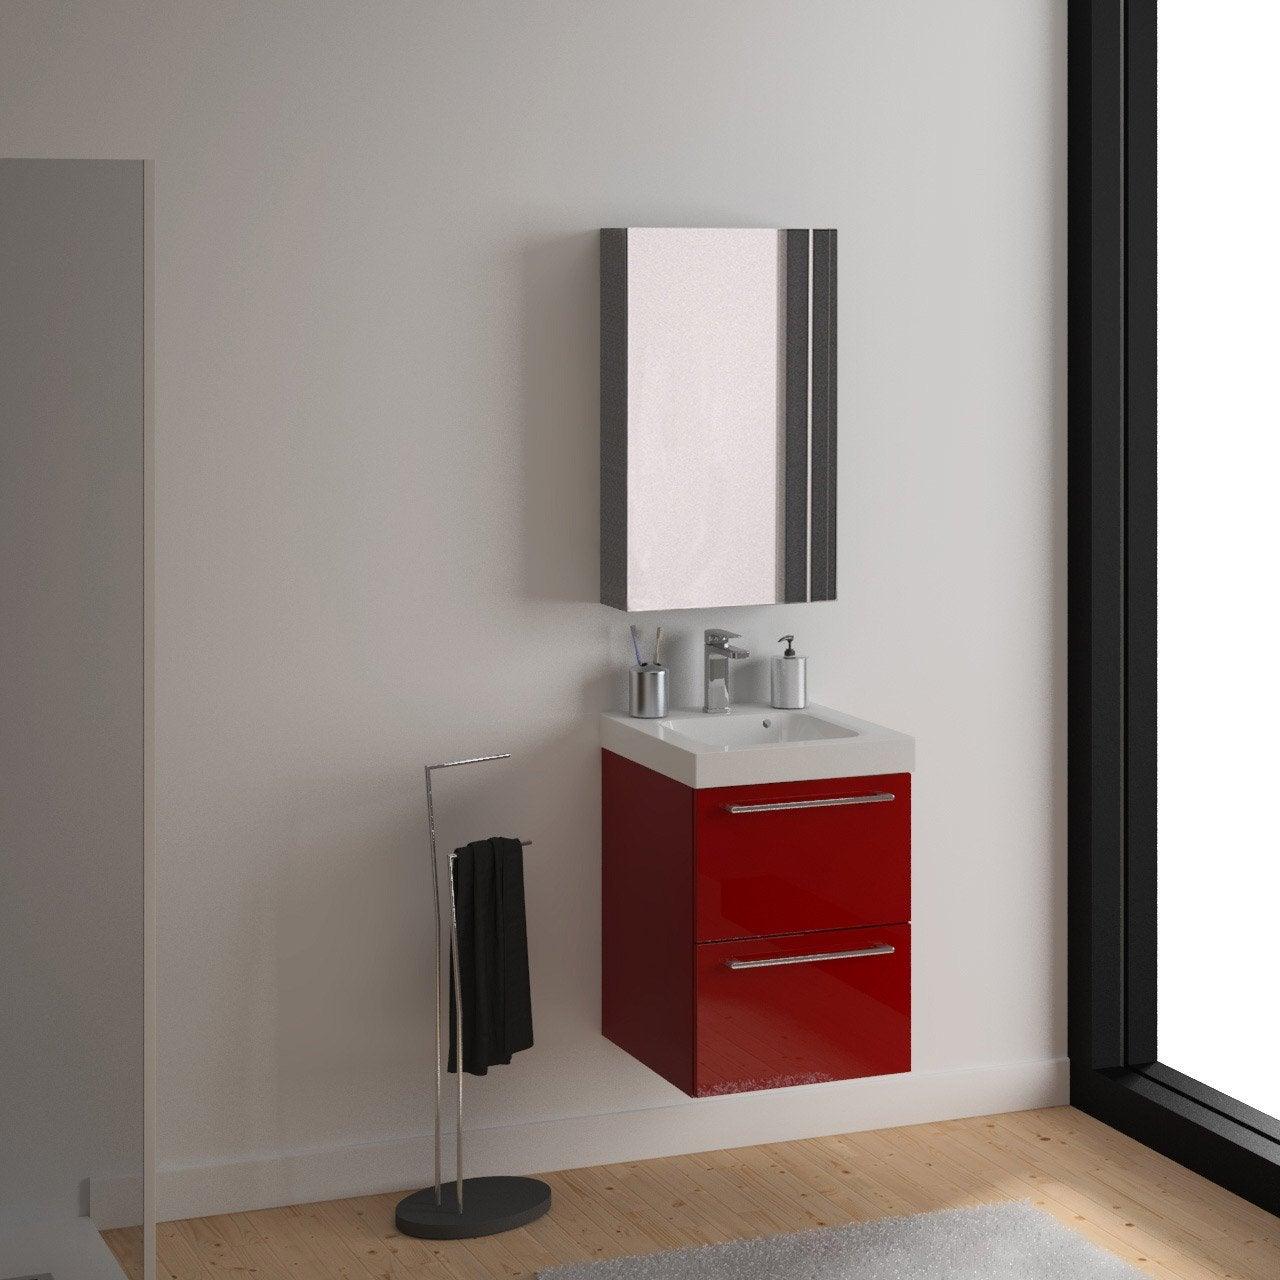 Meuble vasque 46 cm rouge, Remix | Leroy Merlin